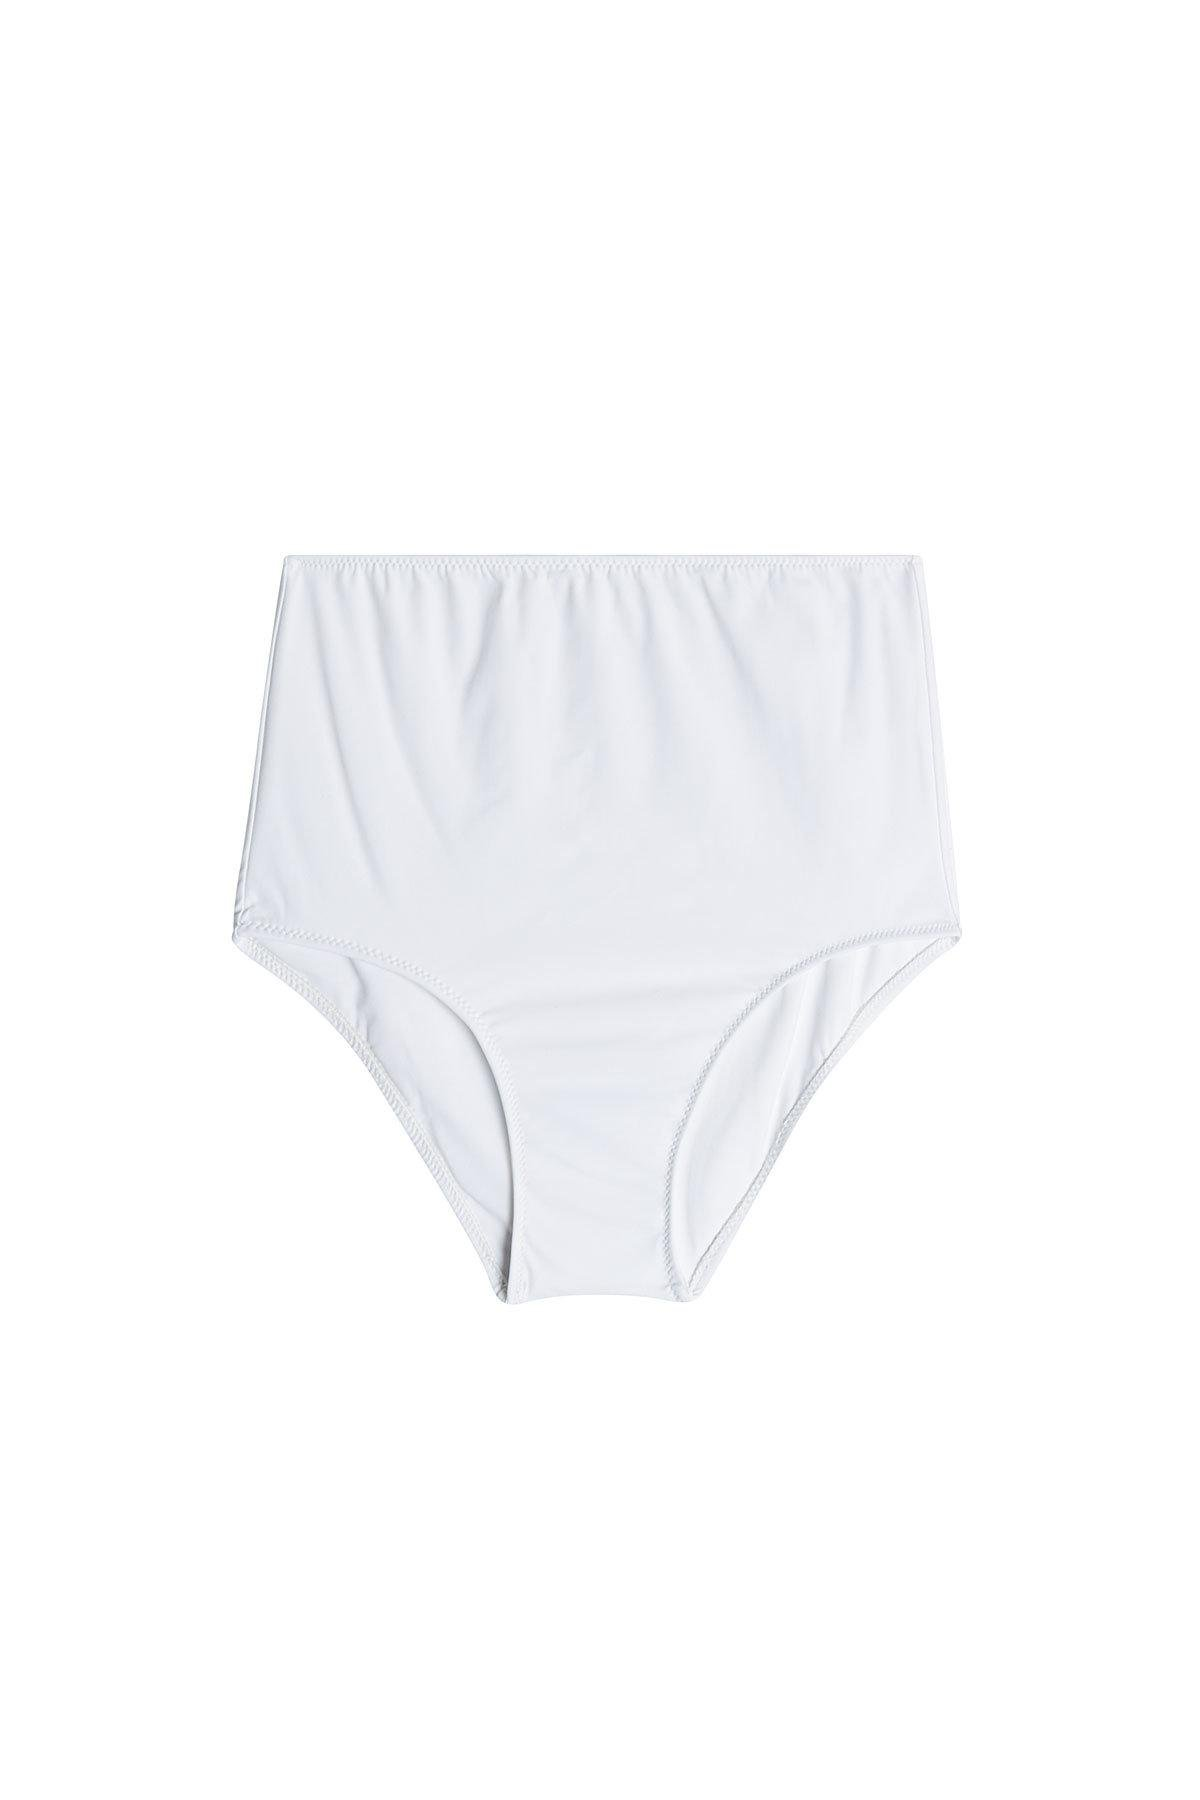 29cbb603eb Araks Mallory Hipster High-waist Bikini Bottoms in White - Lyst